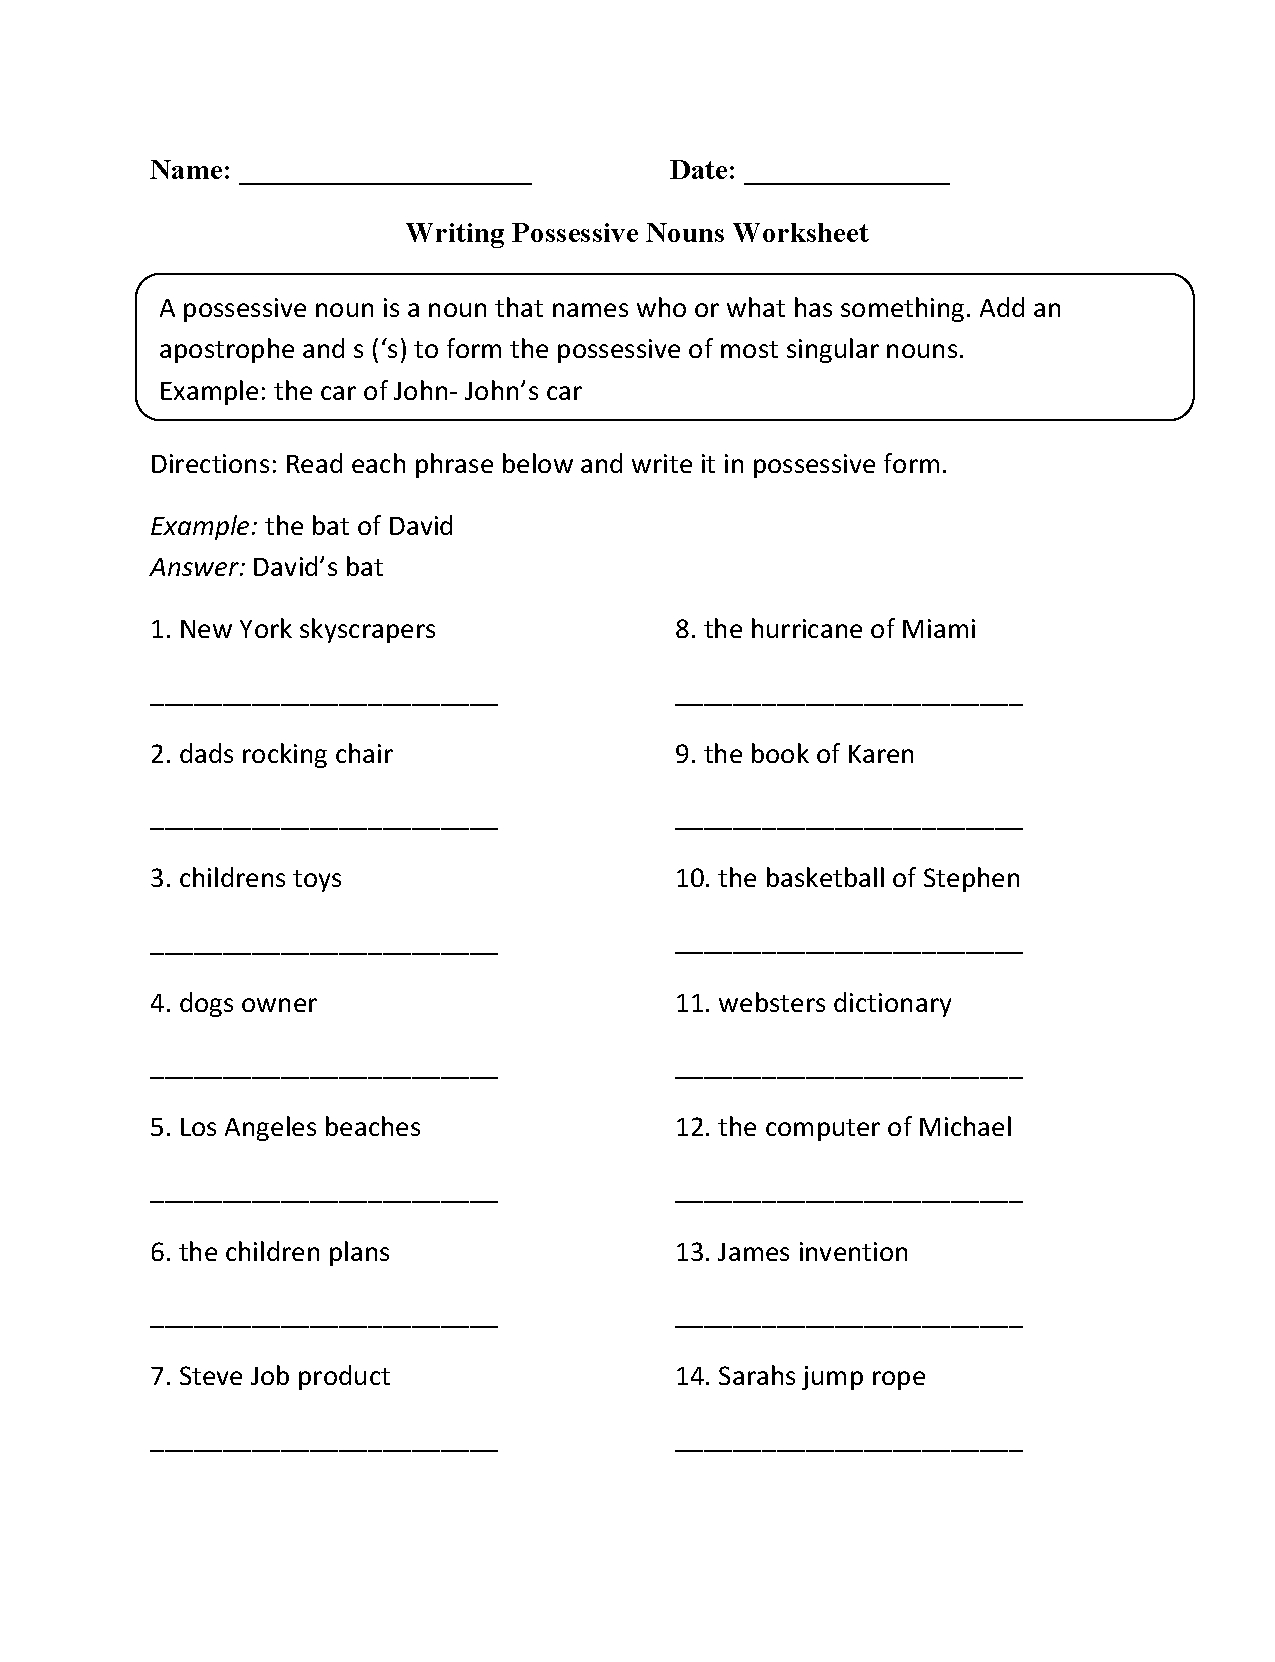 Nouns Worksheets | Possessive Nouns Worksheets | Possessive Nouns Printable Worksheets